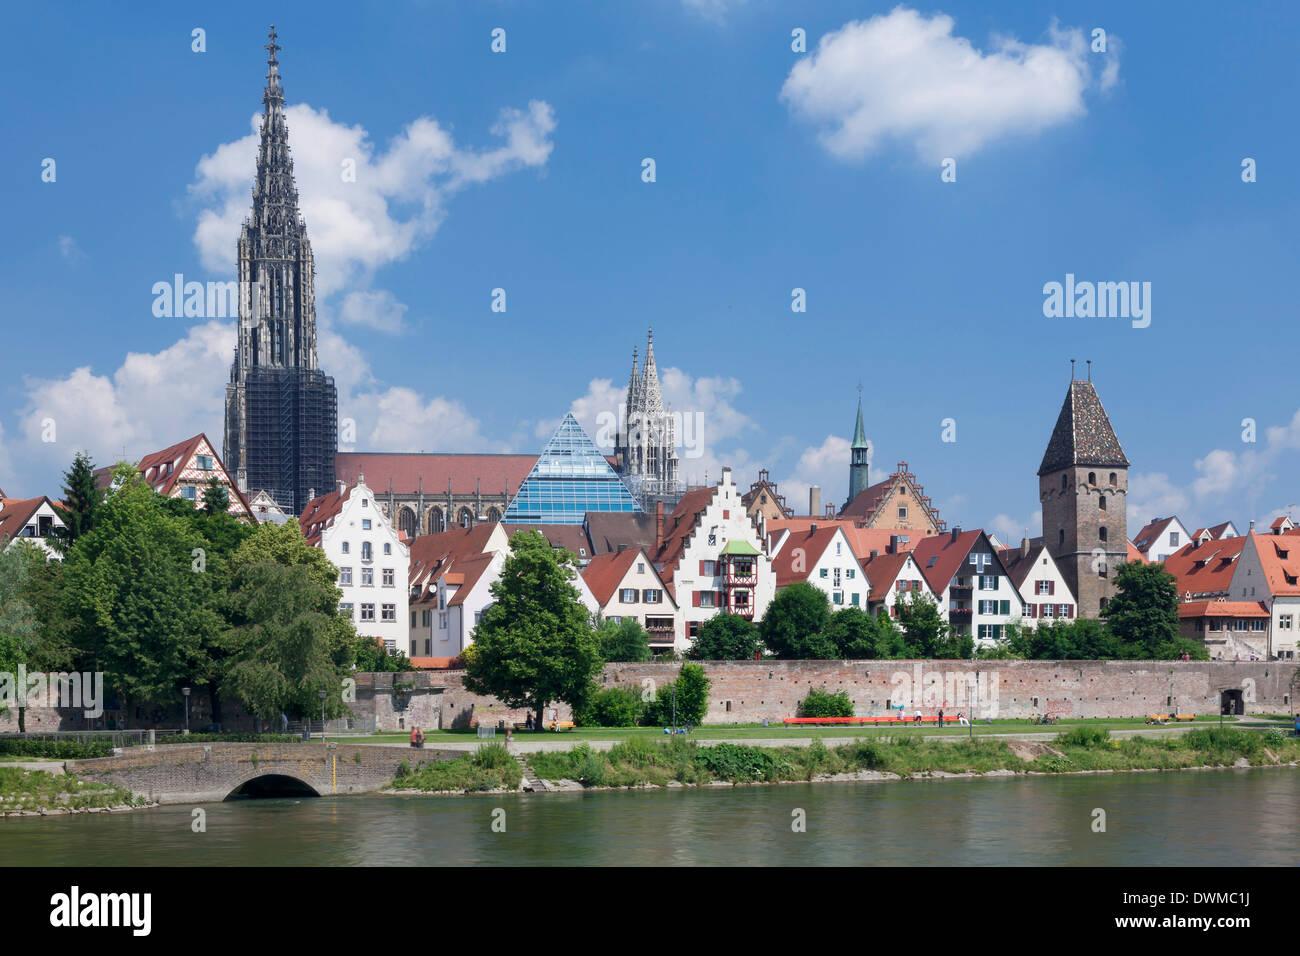 Vue sur le Danube à la vieille ville d'Ulm avec Minster (Münster), Baden Wurtemberg, Allemagne, Europe Banque D'Images